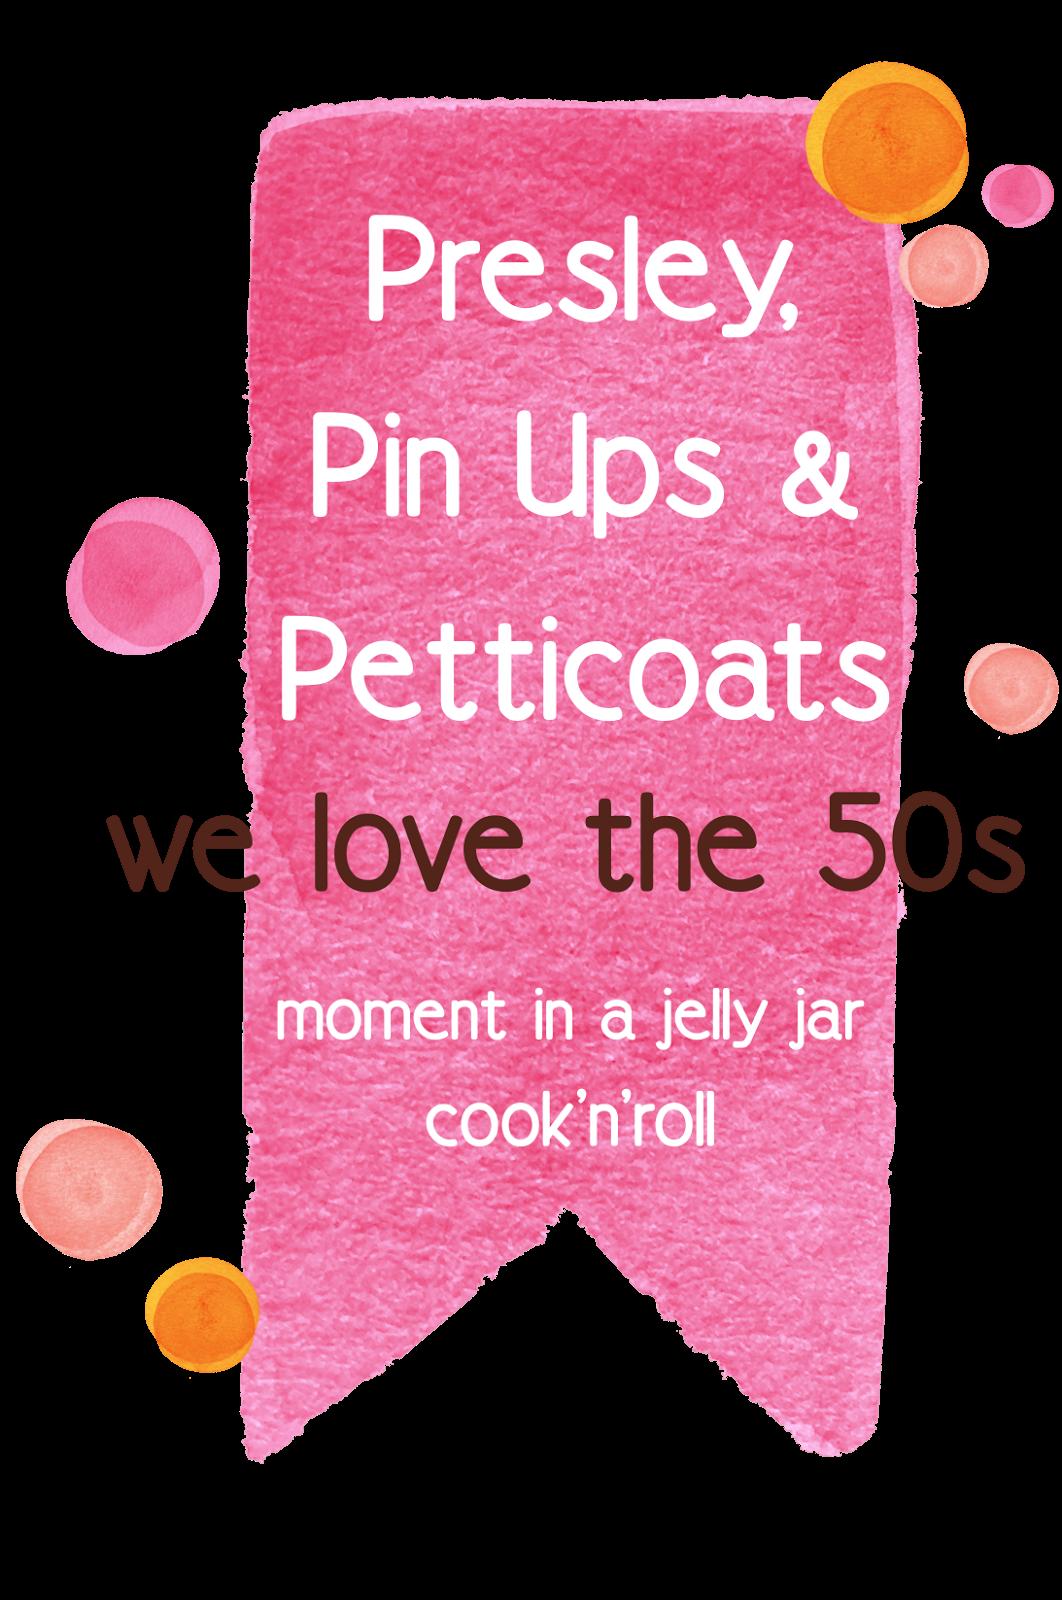 Presley, PinUps & Petticoats - We love the 50ies (bis 31.08.14)